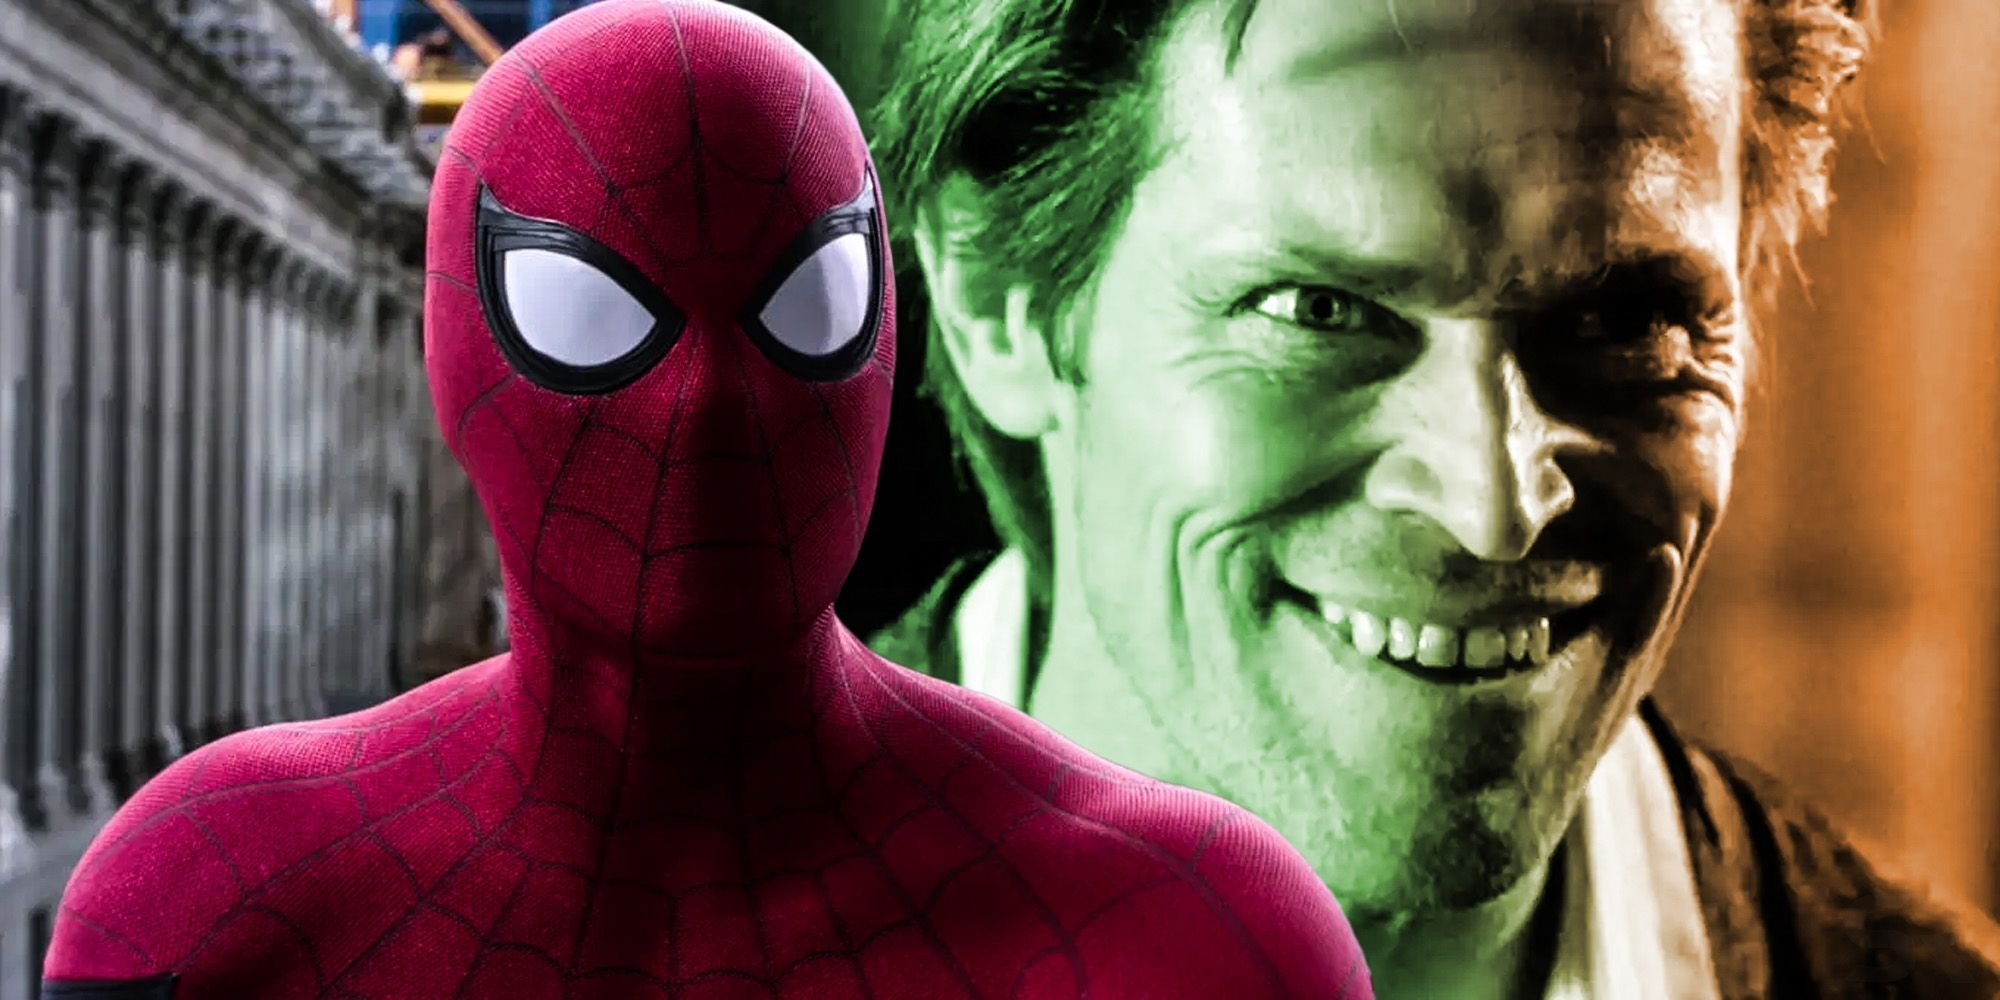 Willem Dafoe's Green Goblin Rumored To Be Spider-Man 3's Main Villain